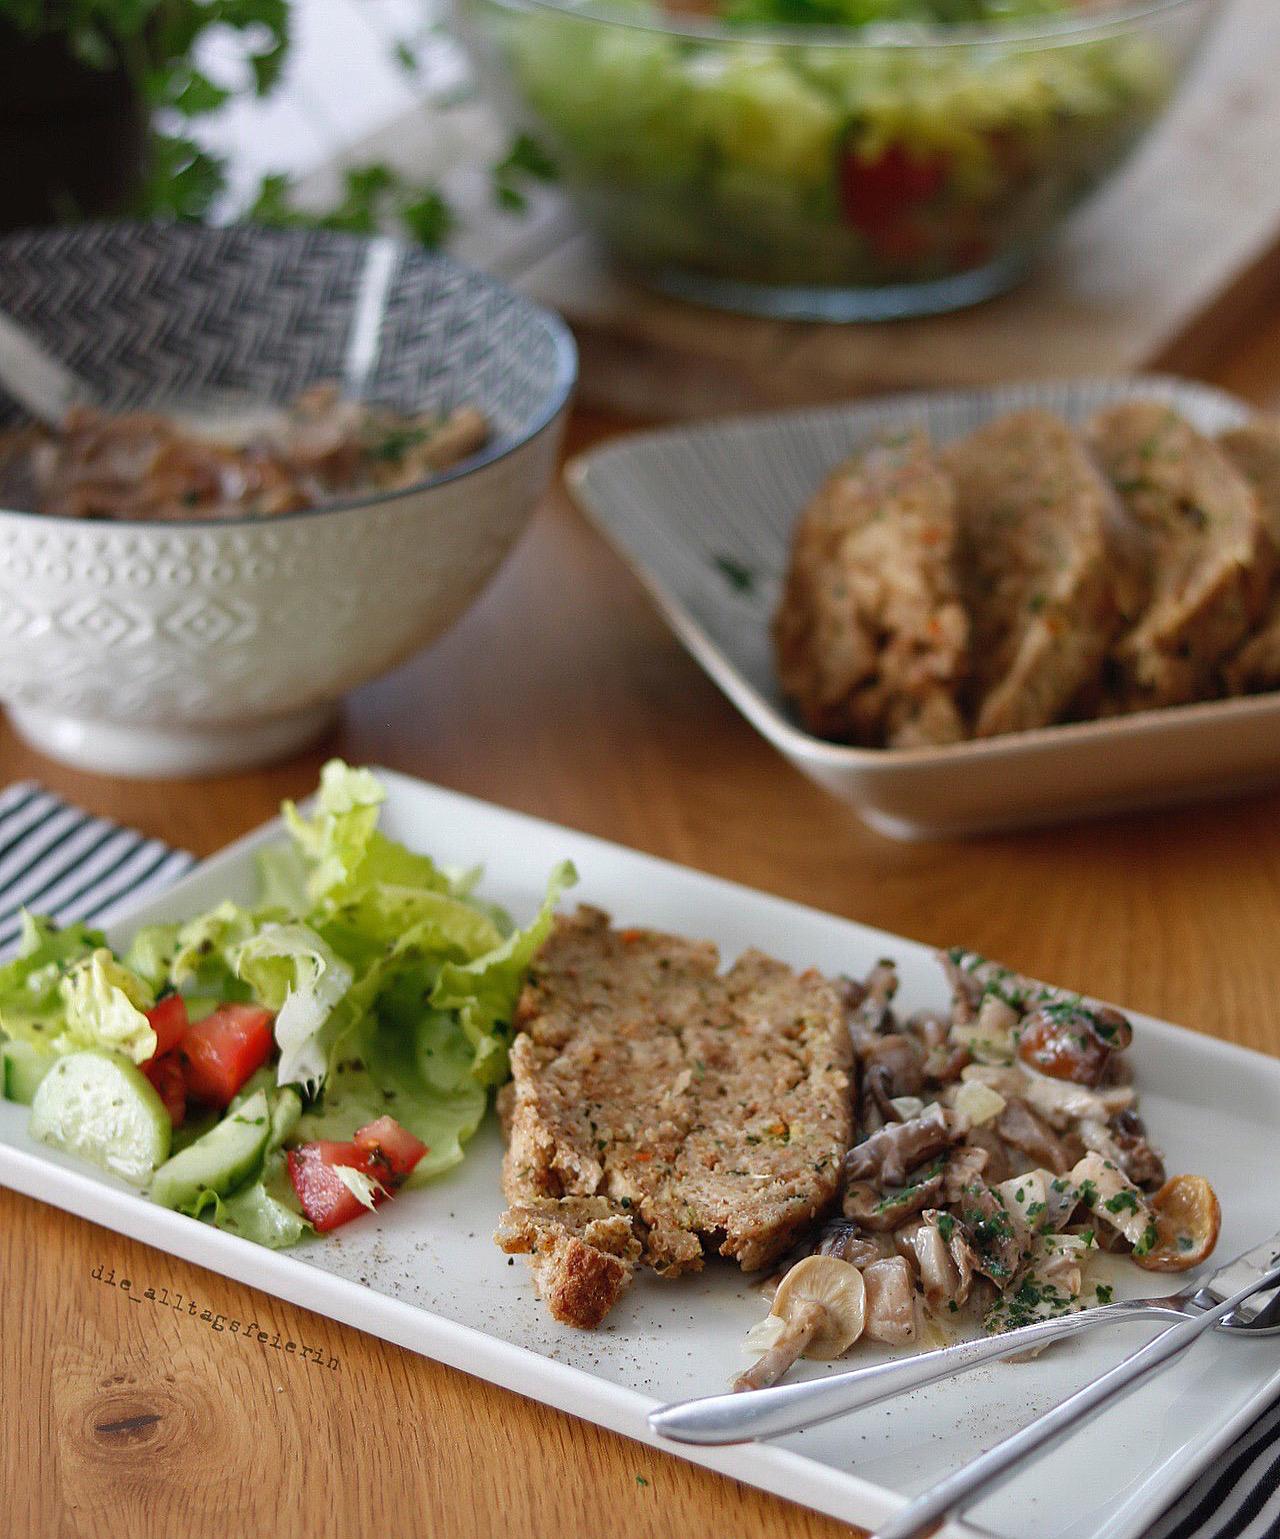 Serviettenknödel mit Pilzrahmsoße und Salat, Essensplan No 10-21